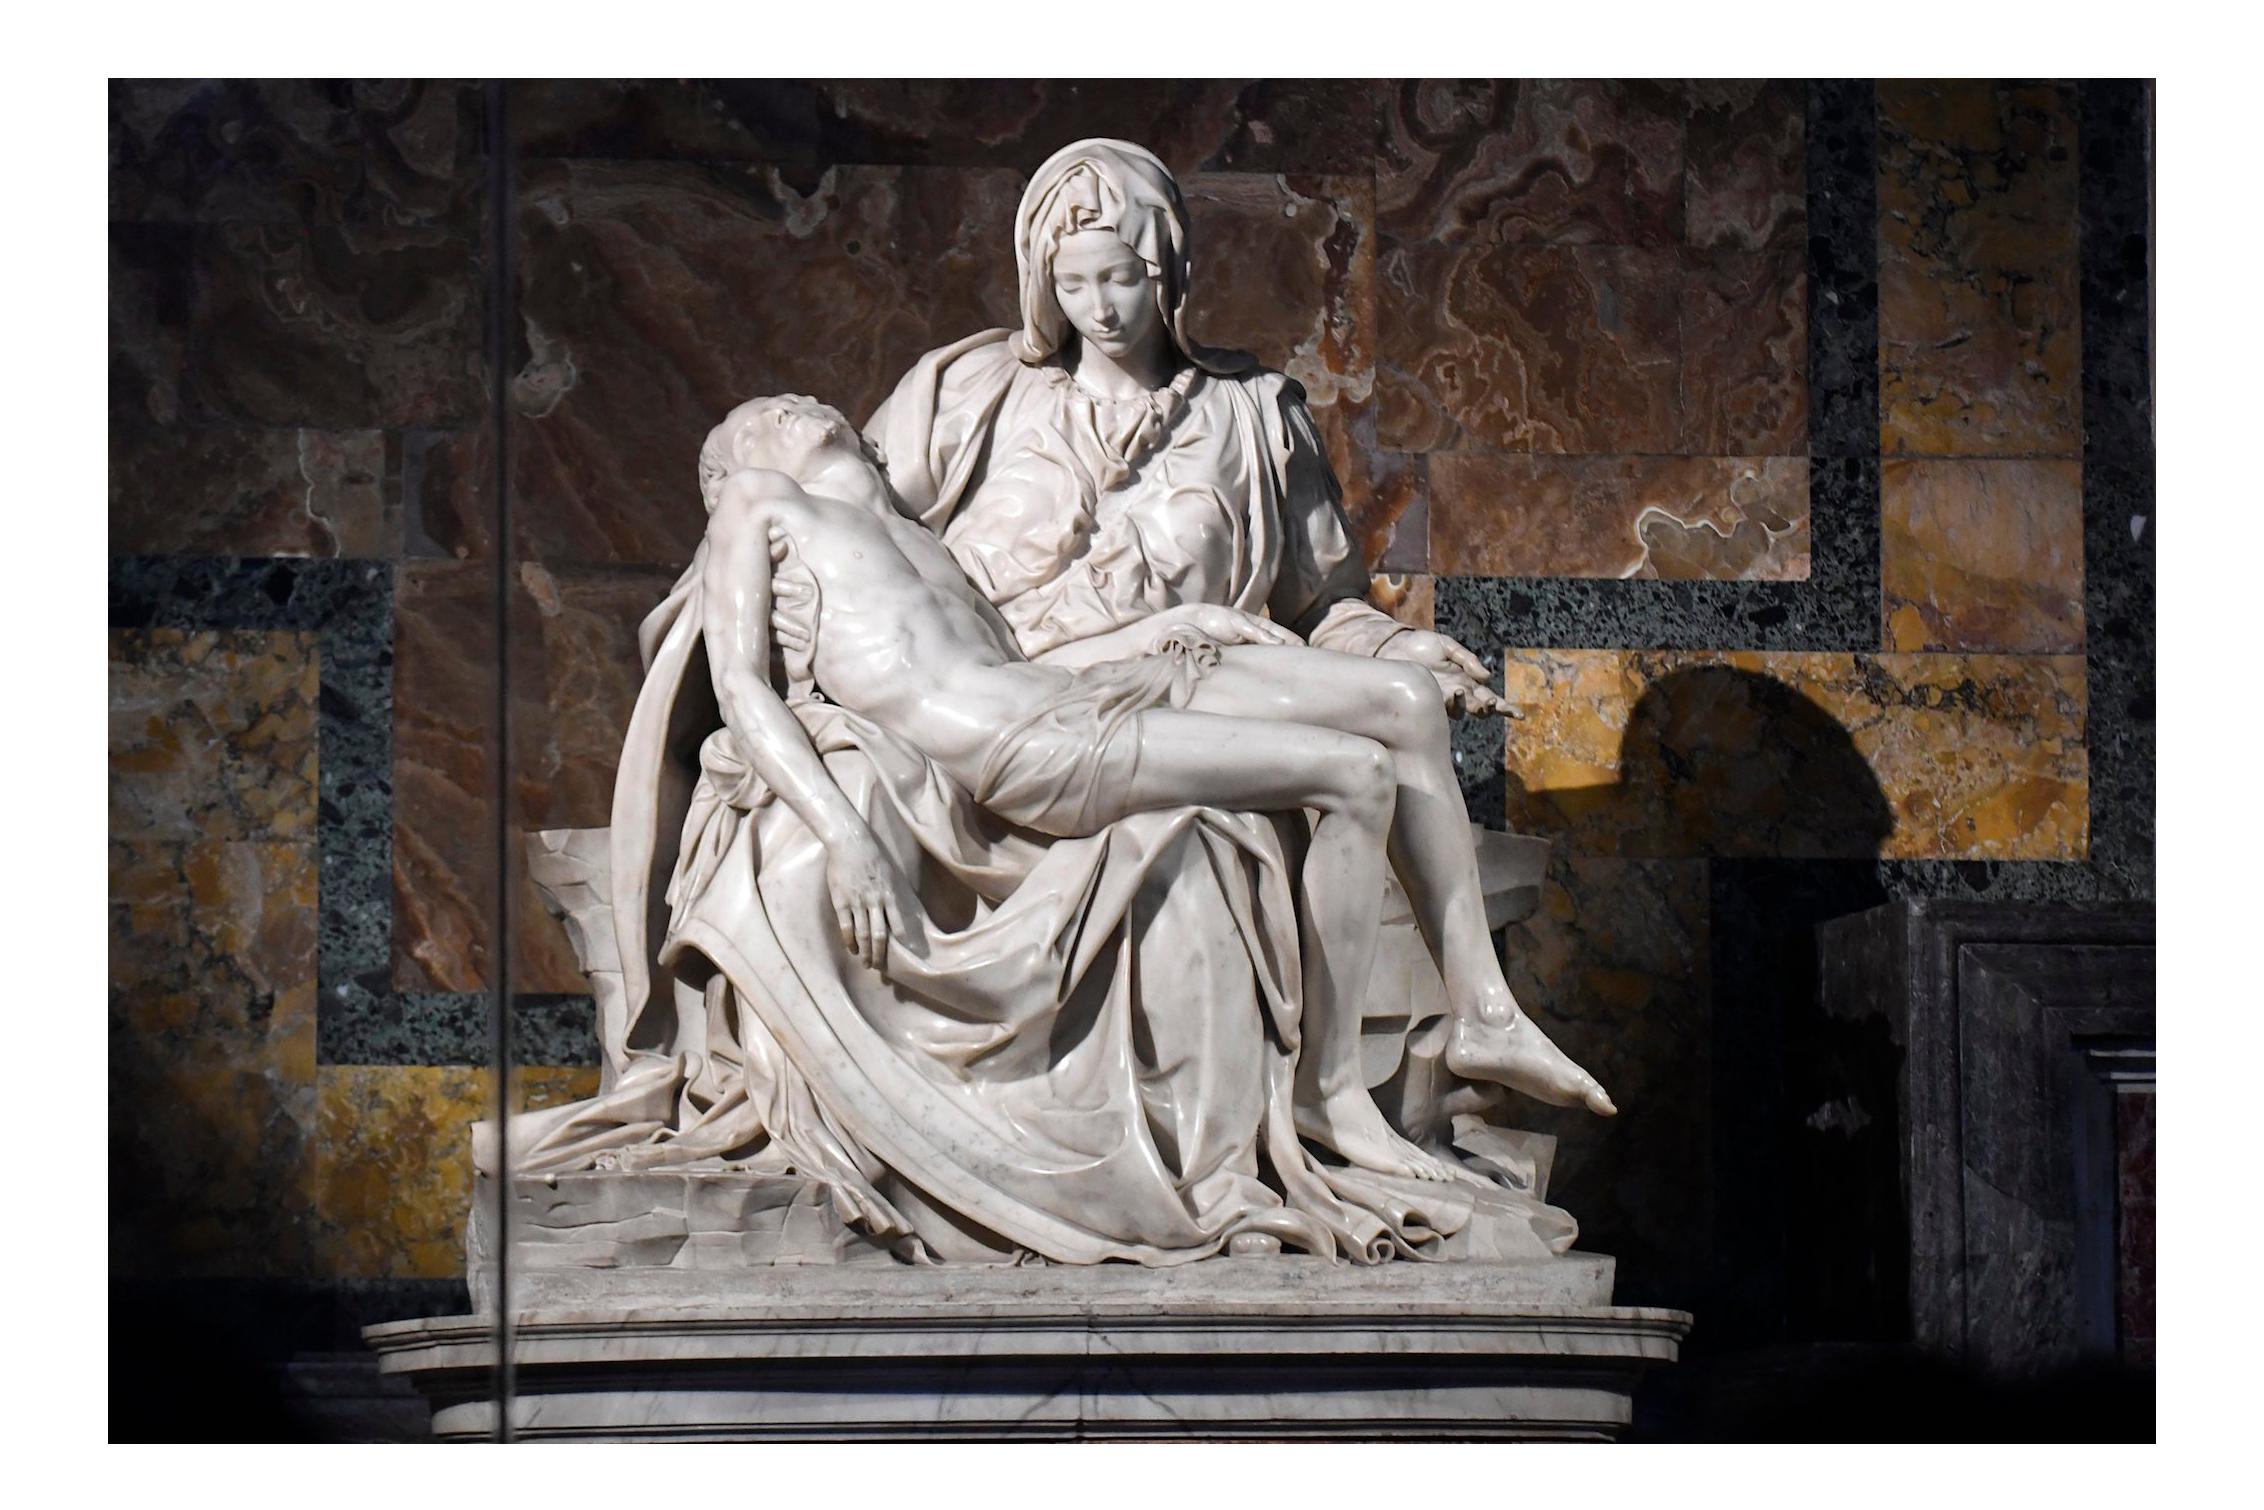 Michelangelo, Pietà, 1498–1499